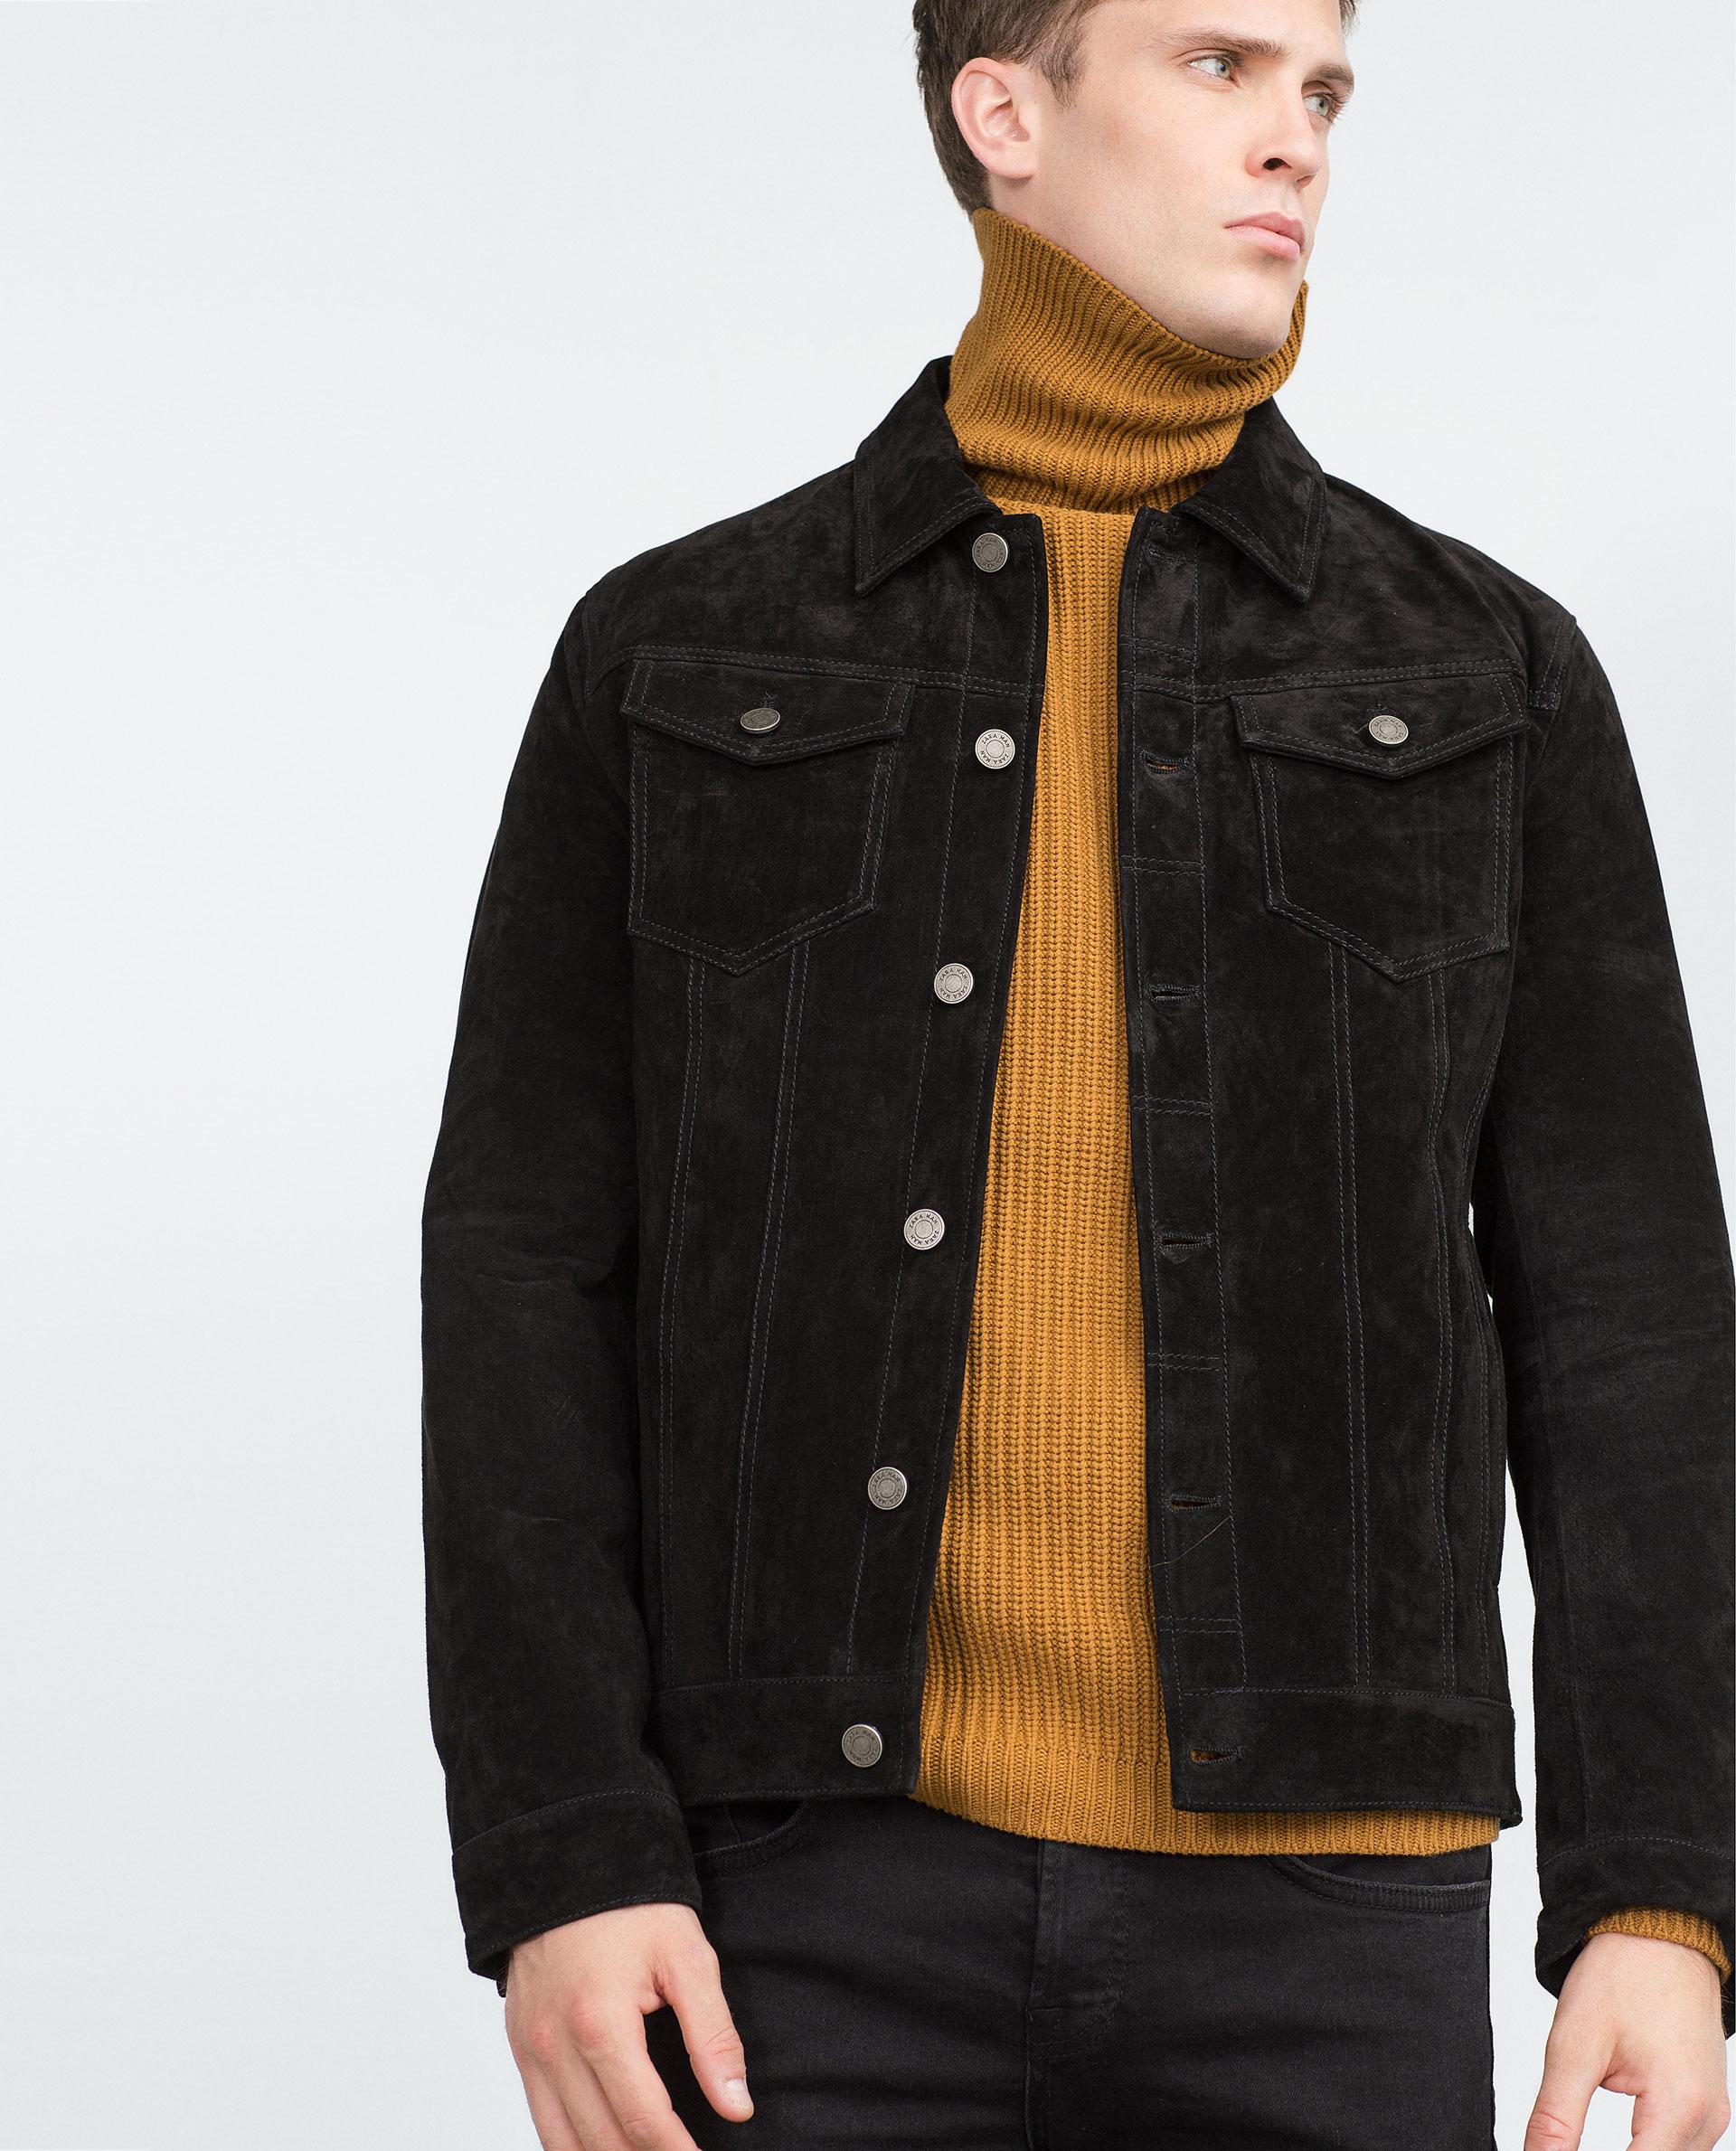 Suede jacket black – Modern fashion jacket photo blog